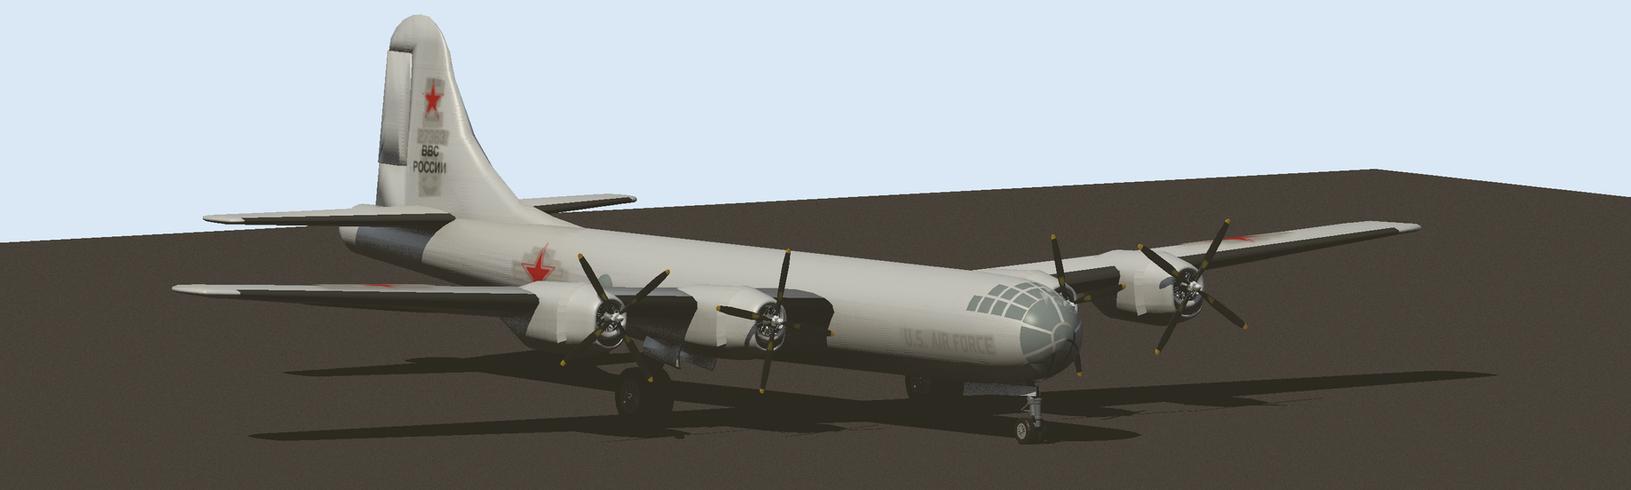 Captured B-29 Bomber by elrunethe2nd